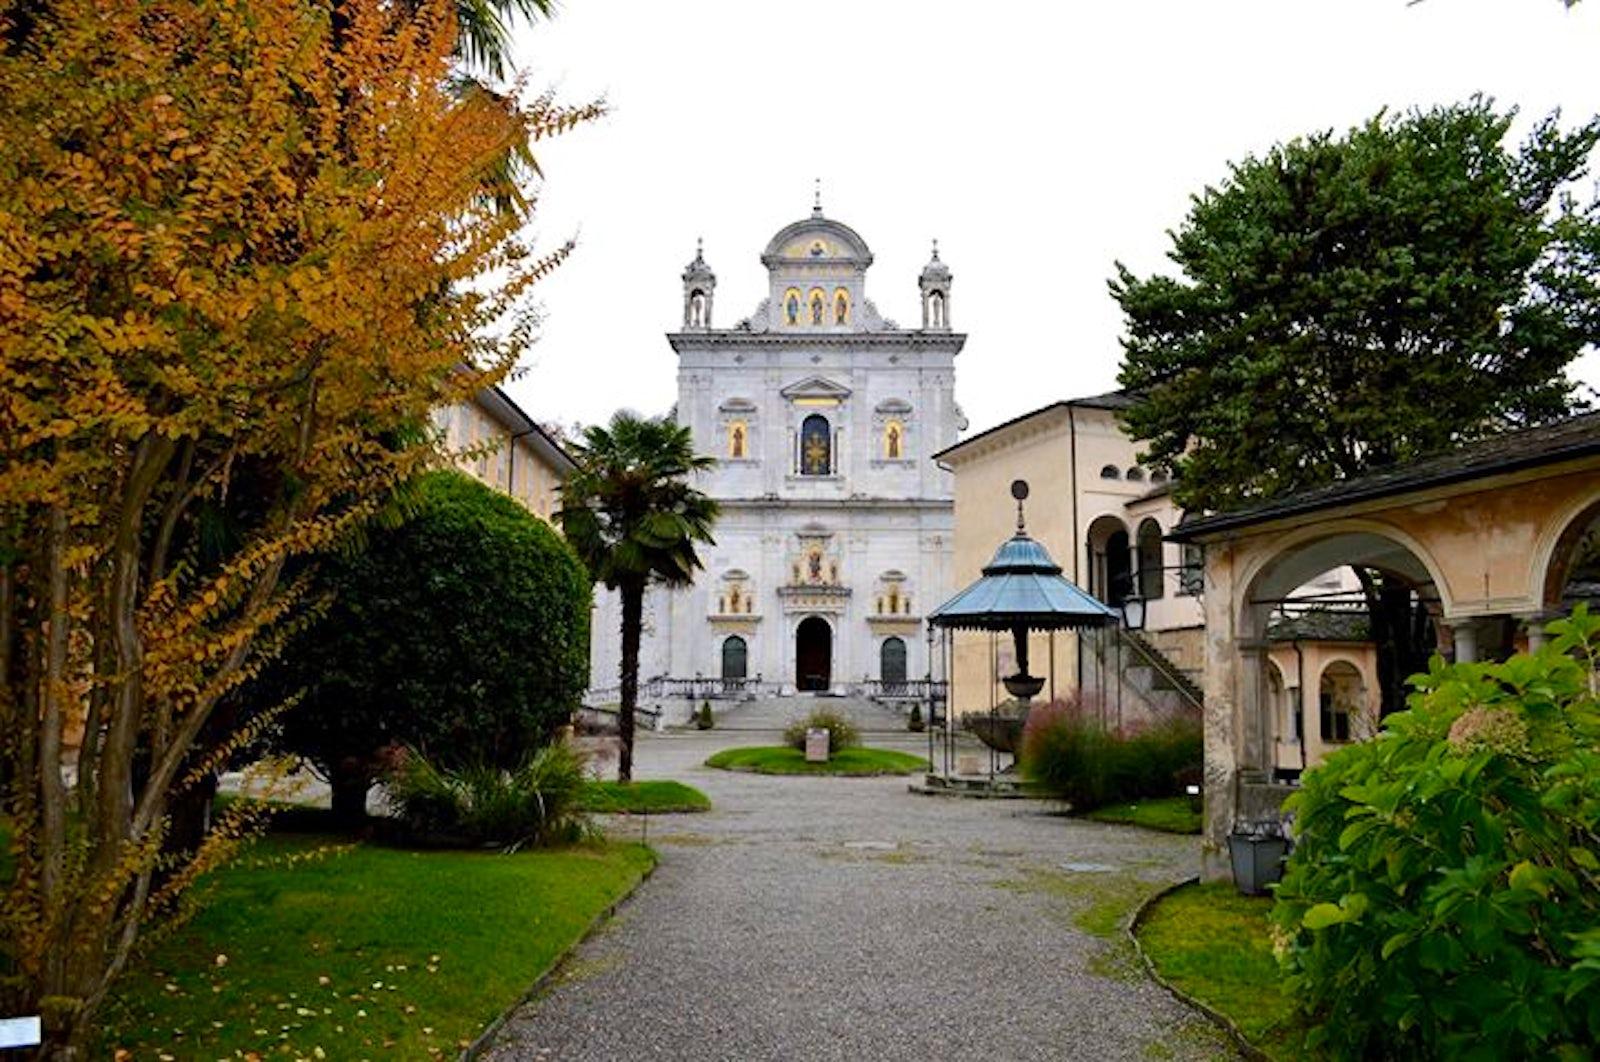 Travel inspired - Location - Sacro Monte di Varallo - Santuario ...